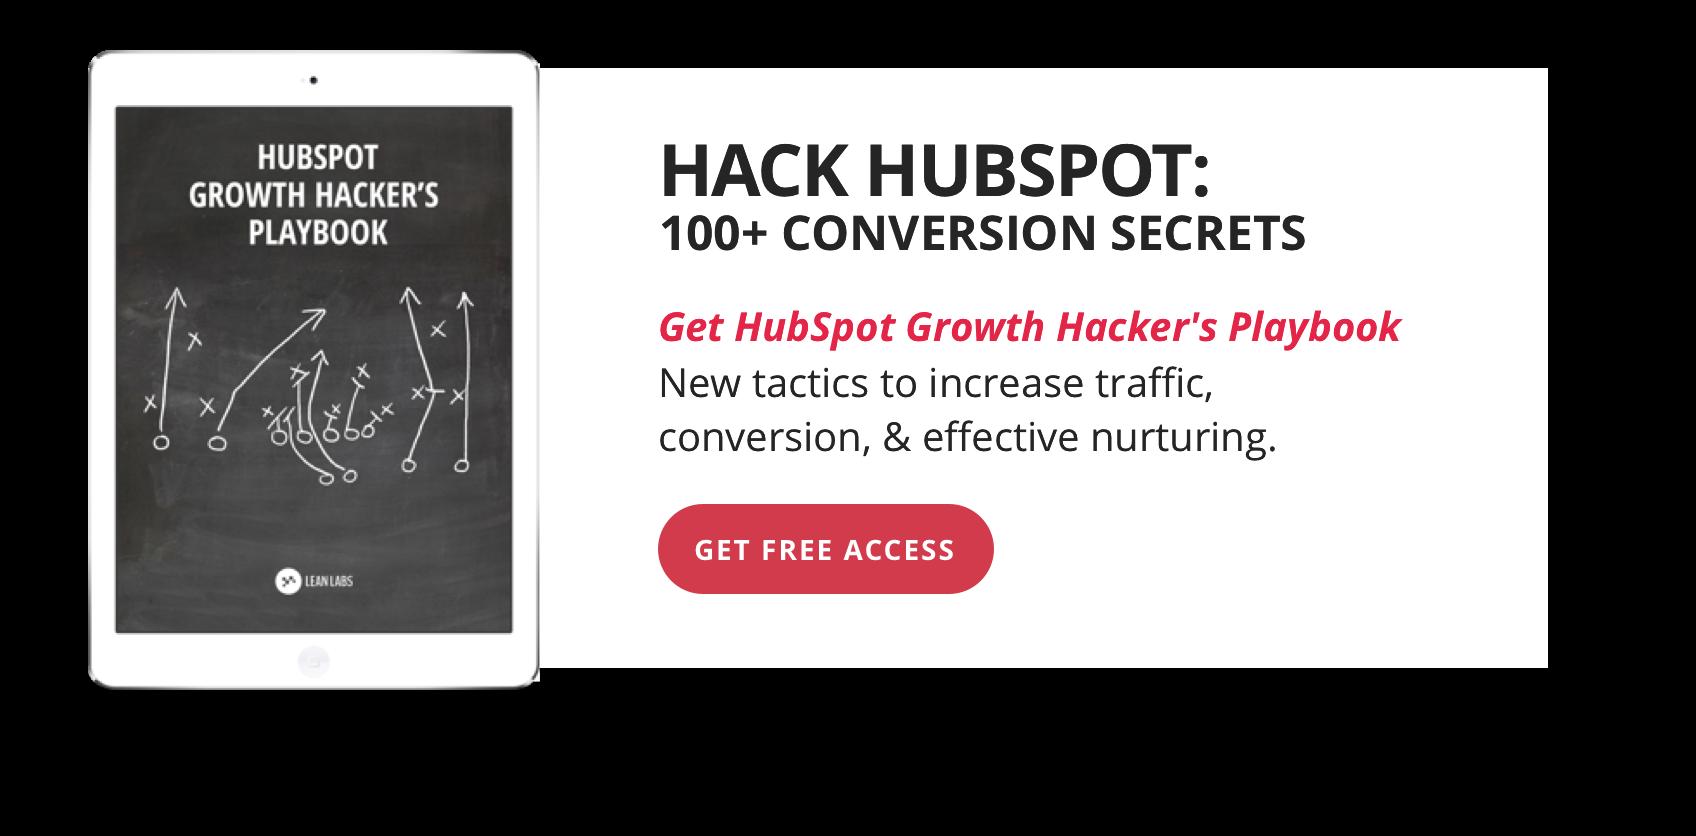 Hack HubSpot